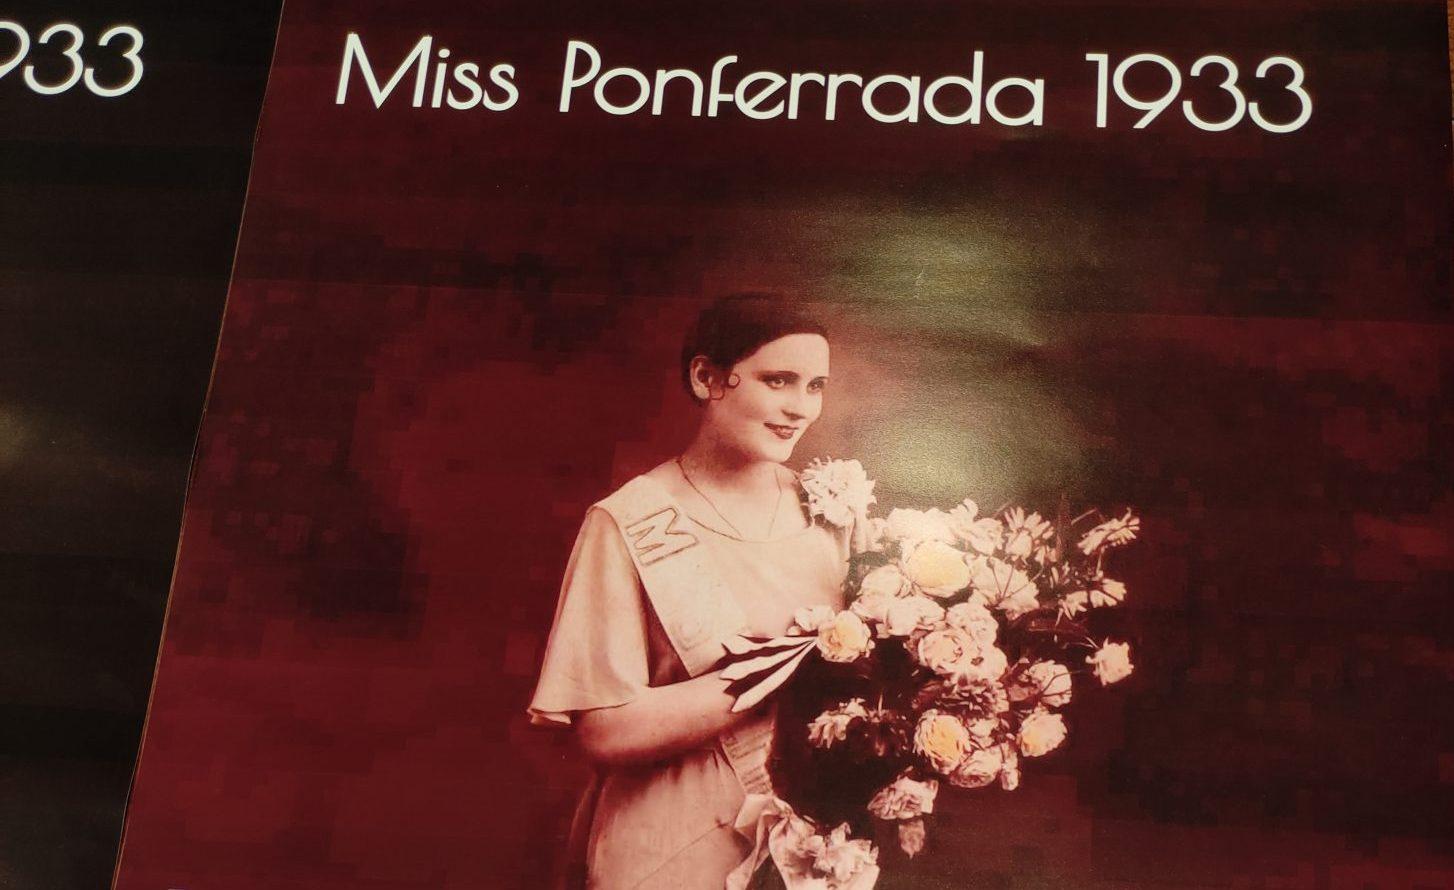 Fabularia Teatro representará 'Miss Ponferrada 1933', la historia de Paquina, una ponferradina que sobrevivió a la represión franquista 1